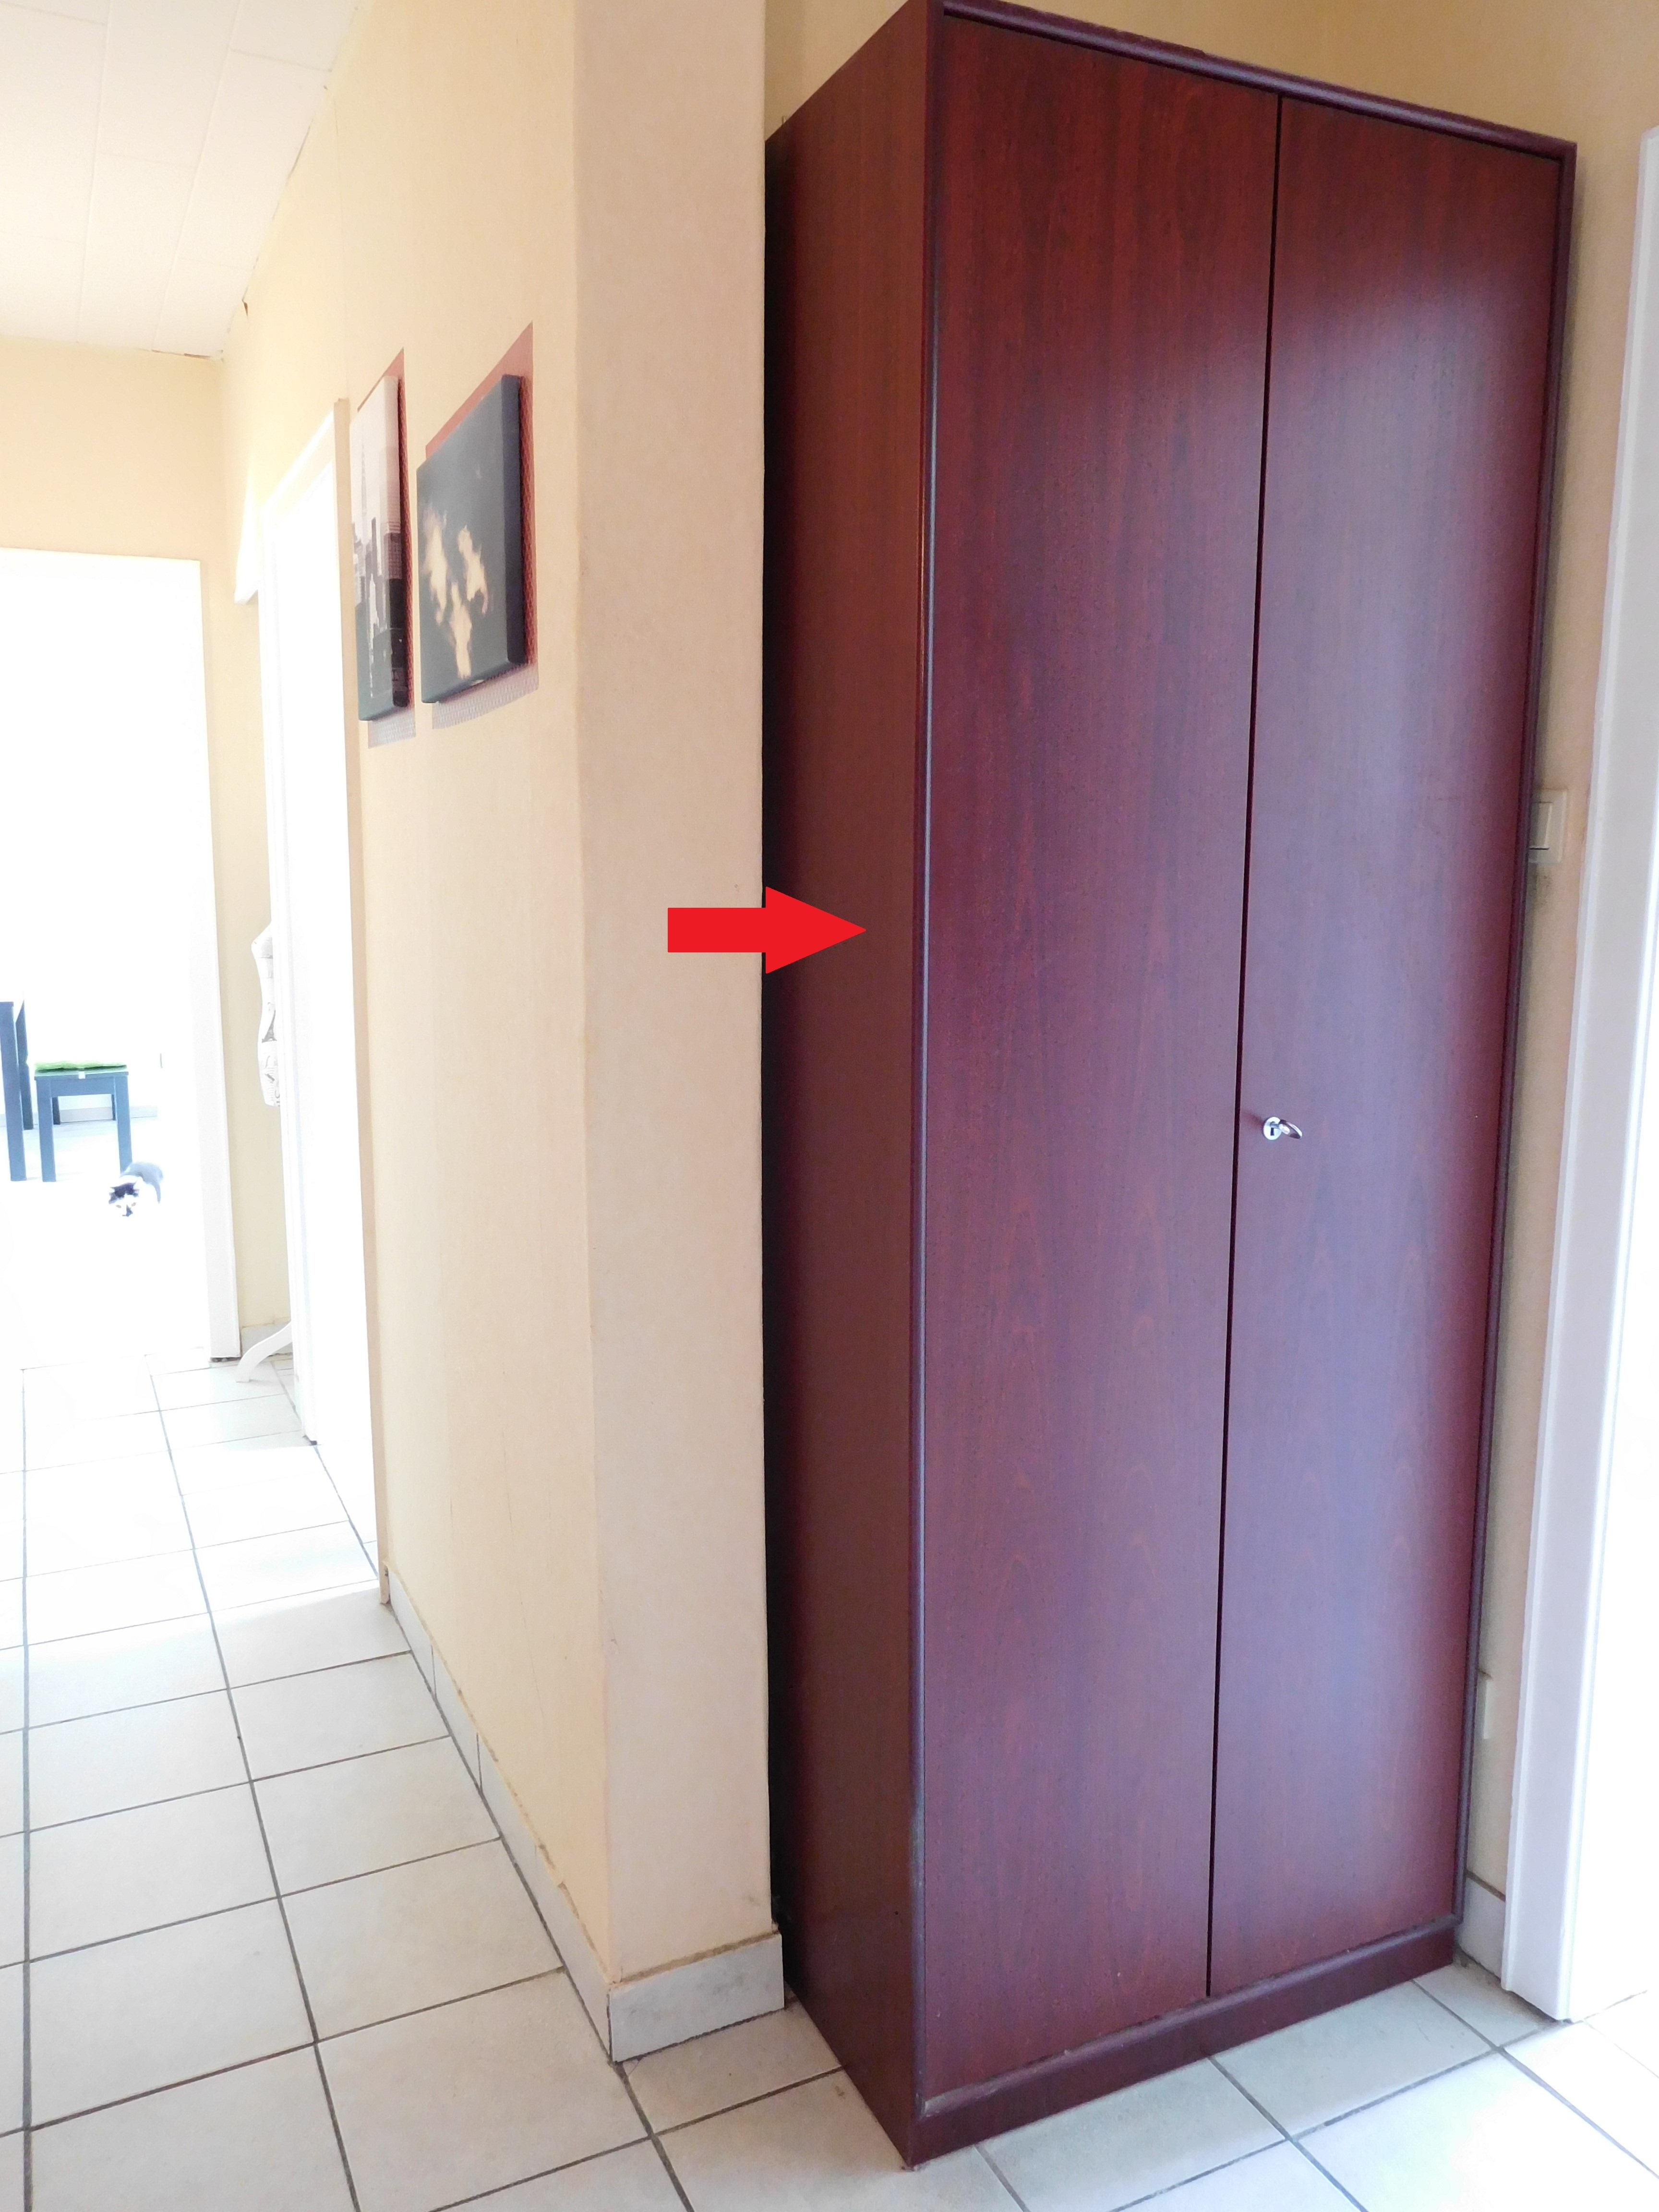 flohmarkt hausflohmarkt tr delmarkt oelde in 59302 oelde flohmarkt. Black Bedroom Furniture Sets. Home Design Ideas